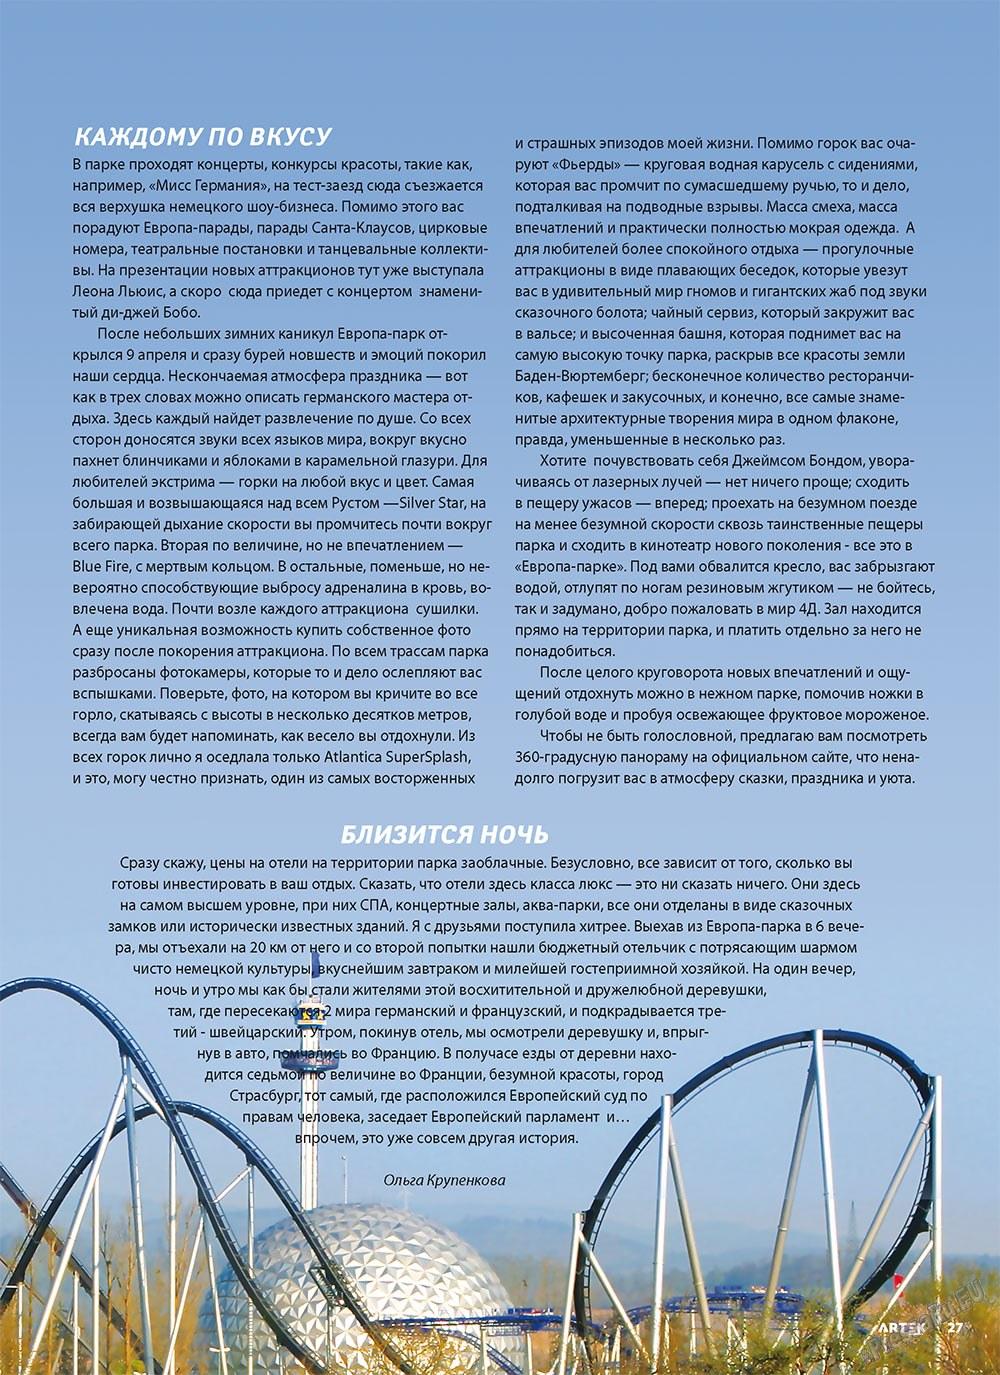 Артек (журнал). 2011 год, номер 2, стр. 29